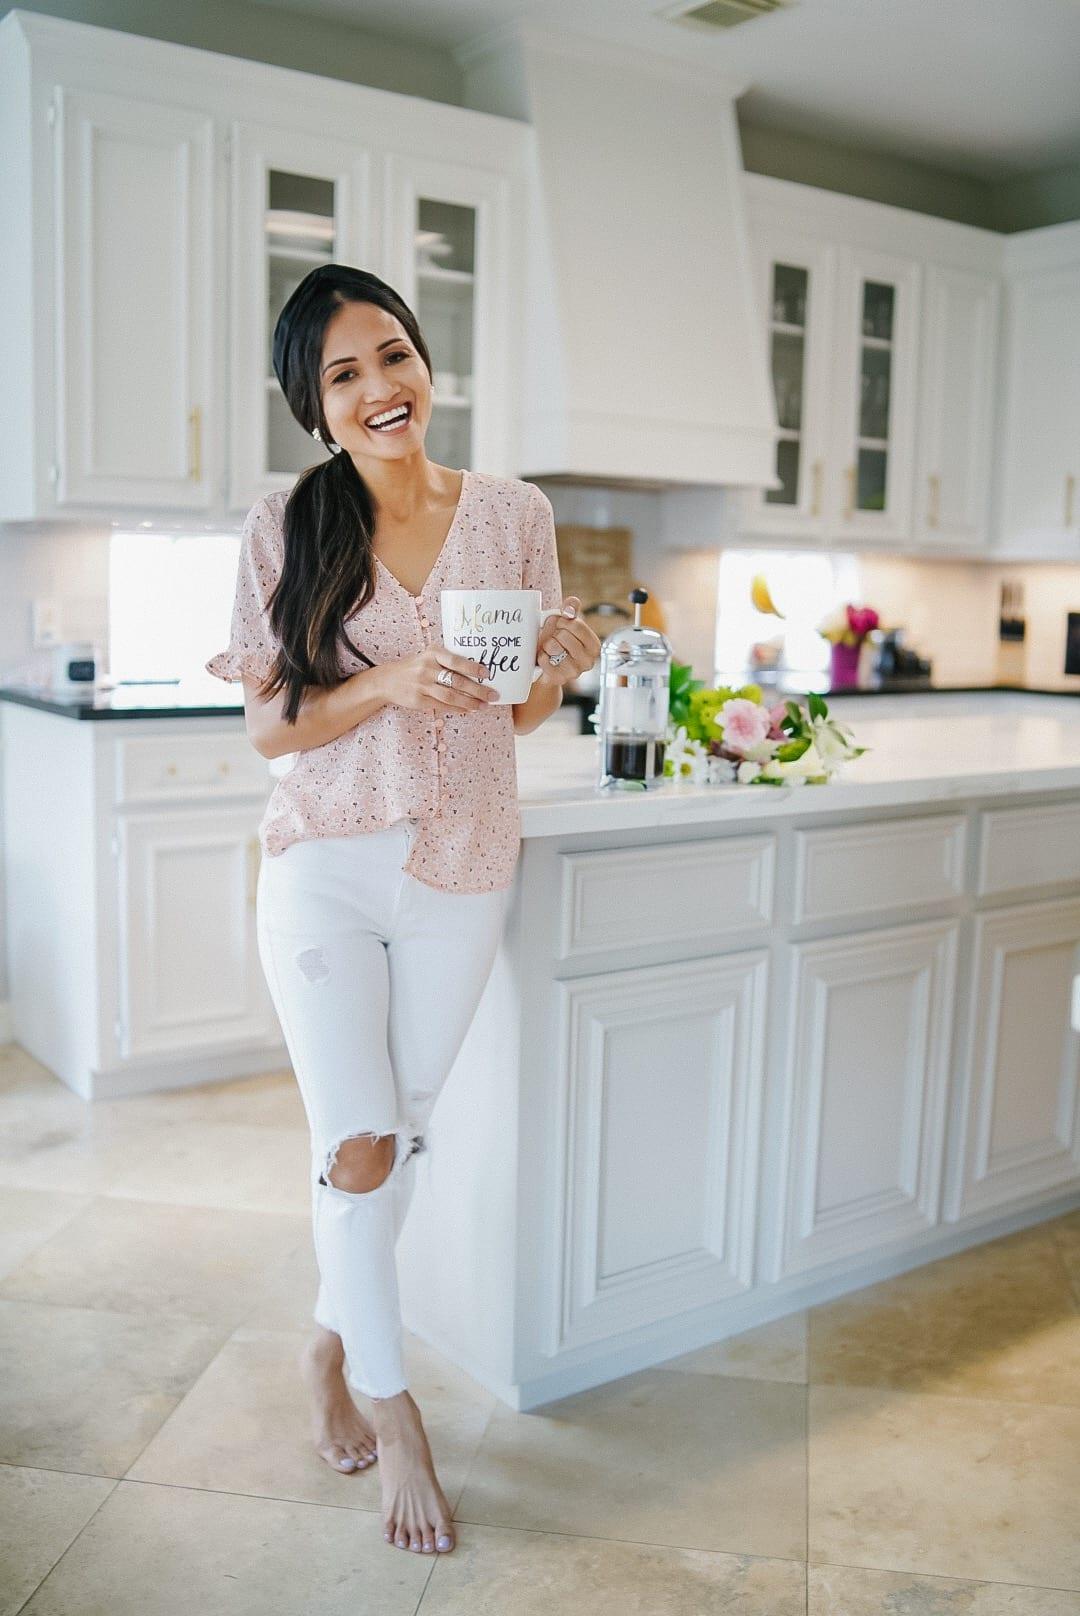 momma needs some coffee mug, white kitchen, kitchen design